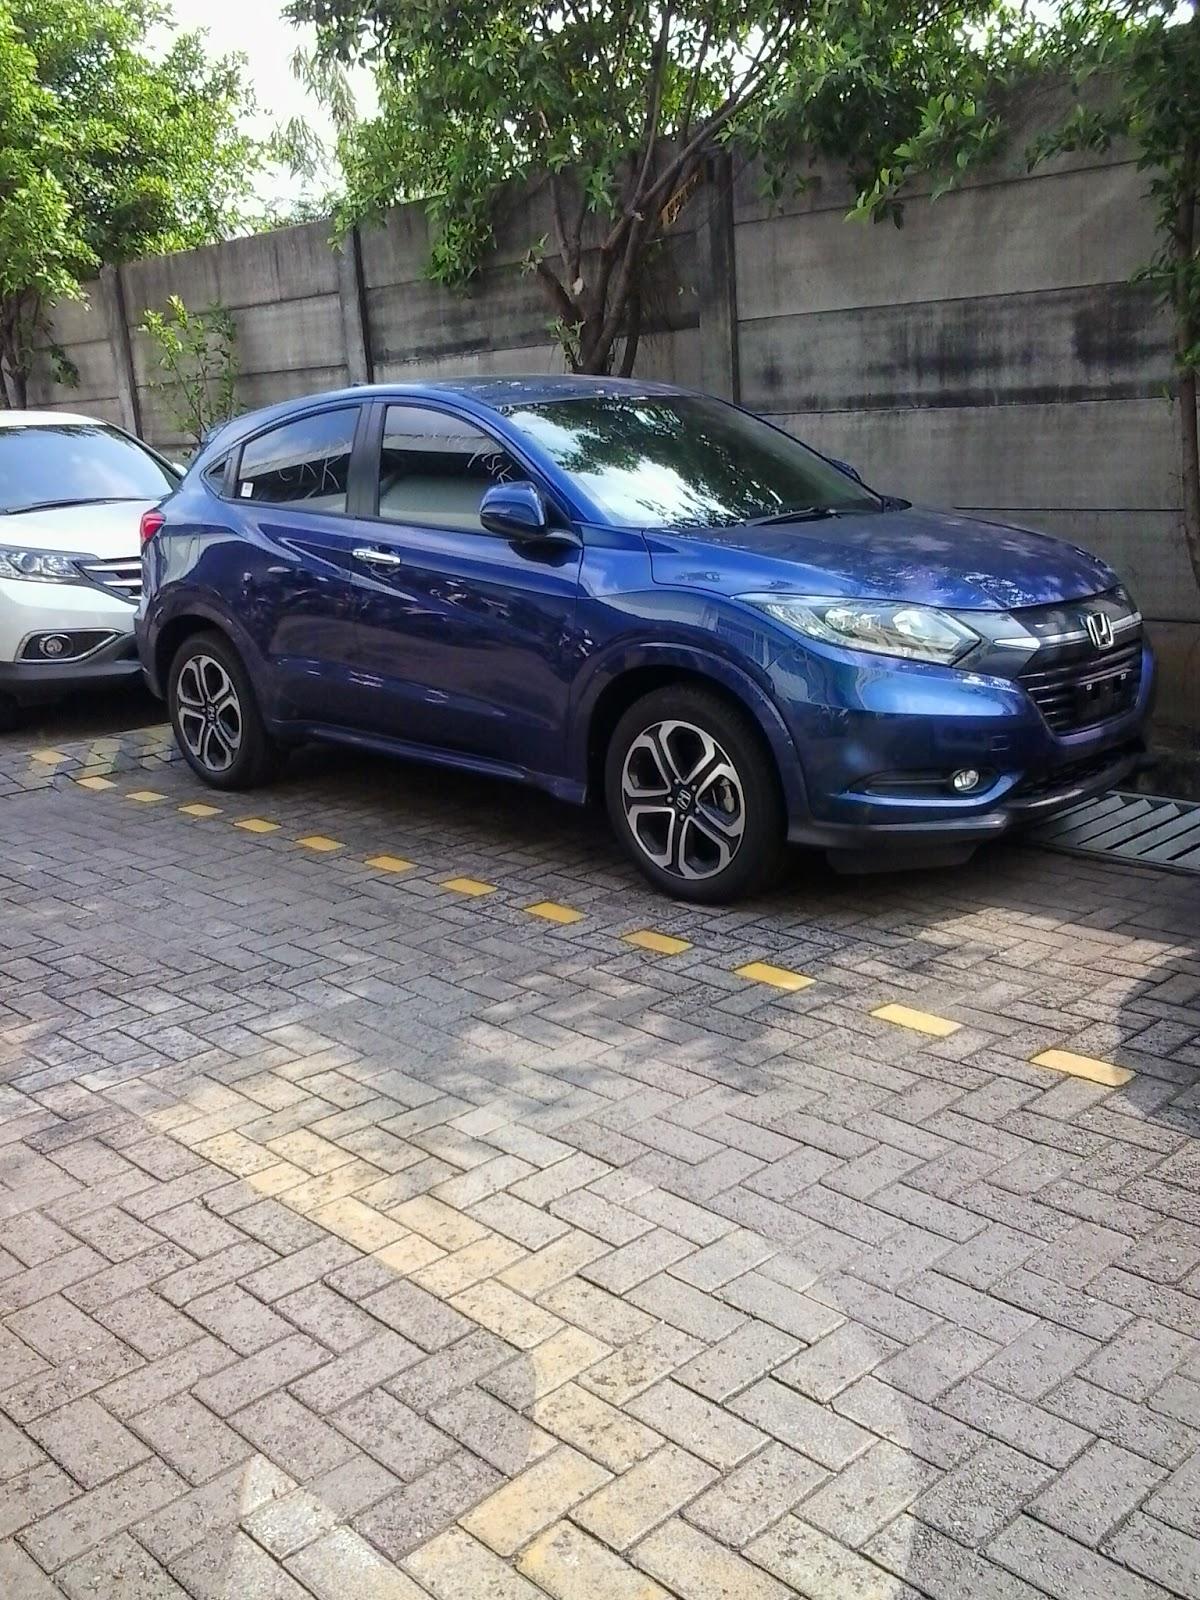 Mobil Honda HRV Berwarna Biru